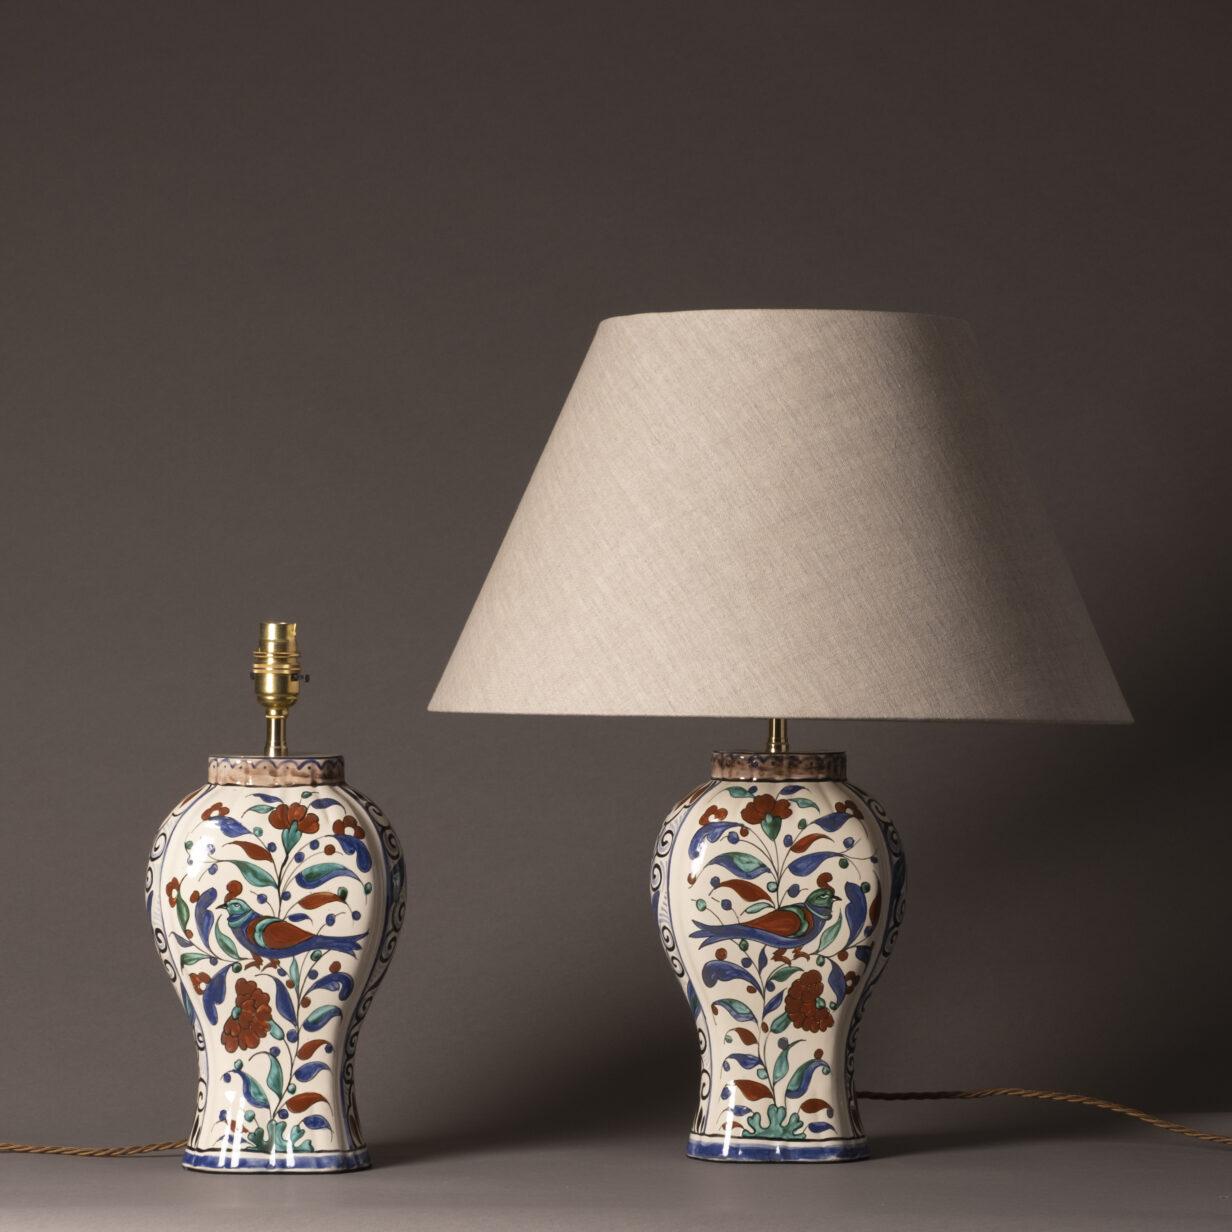 Pair of Faience Bird Lamps